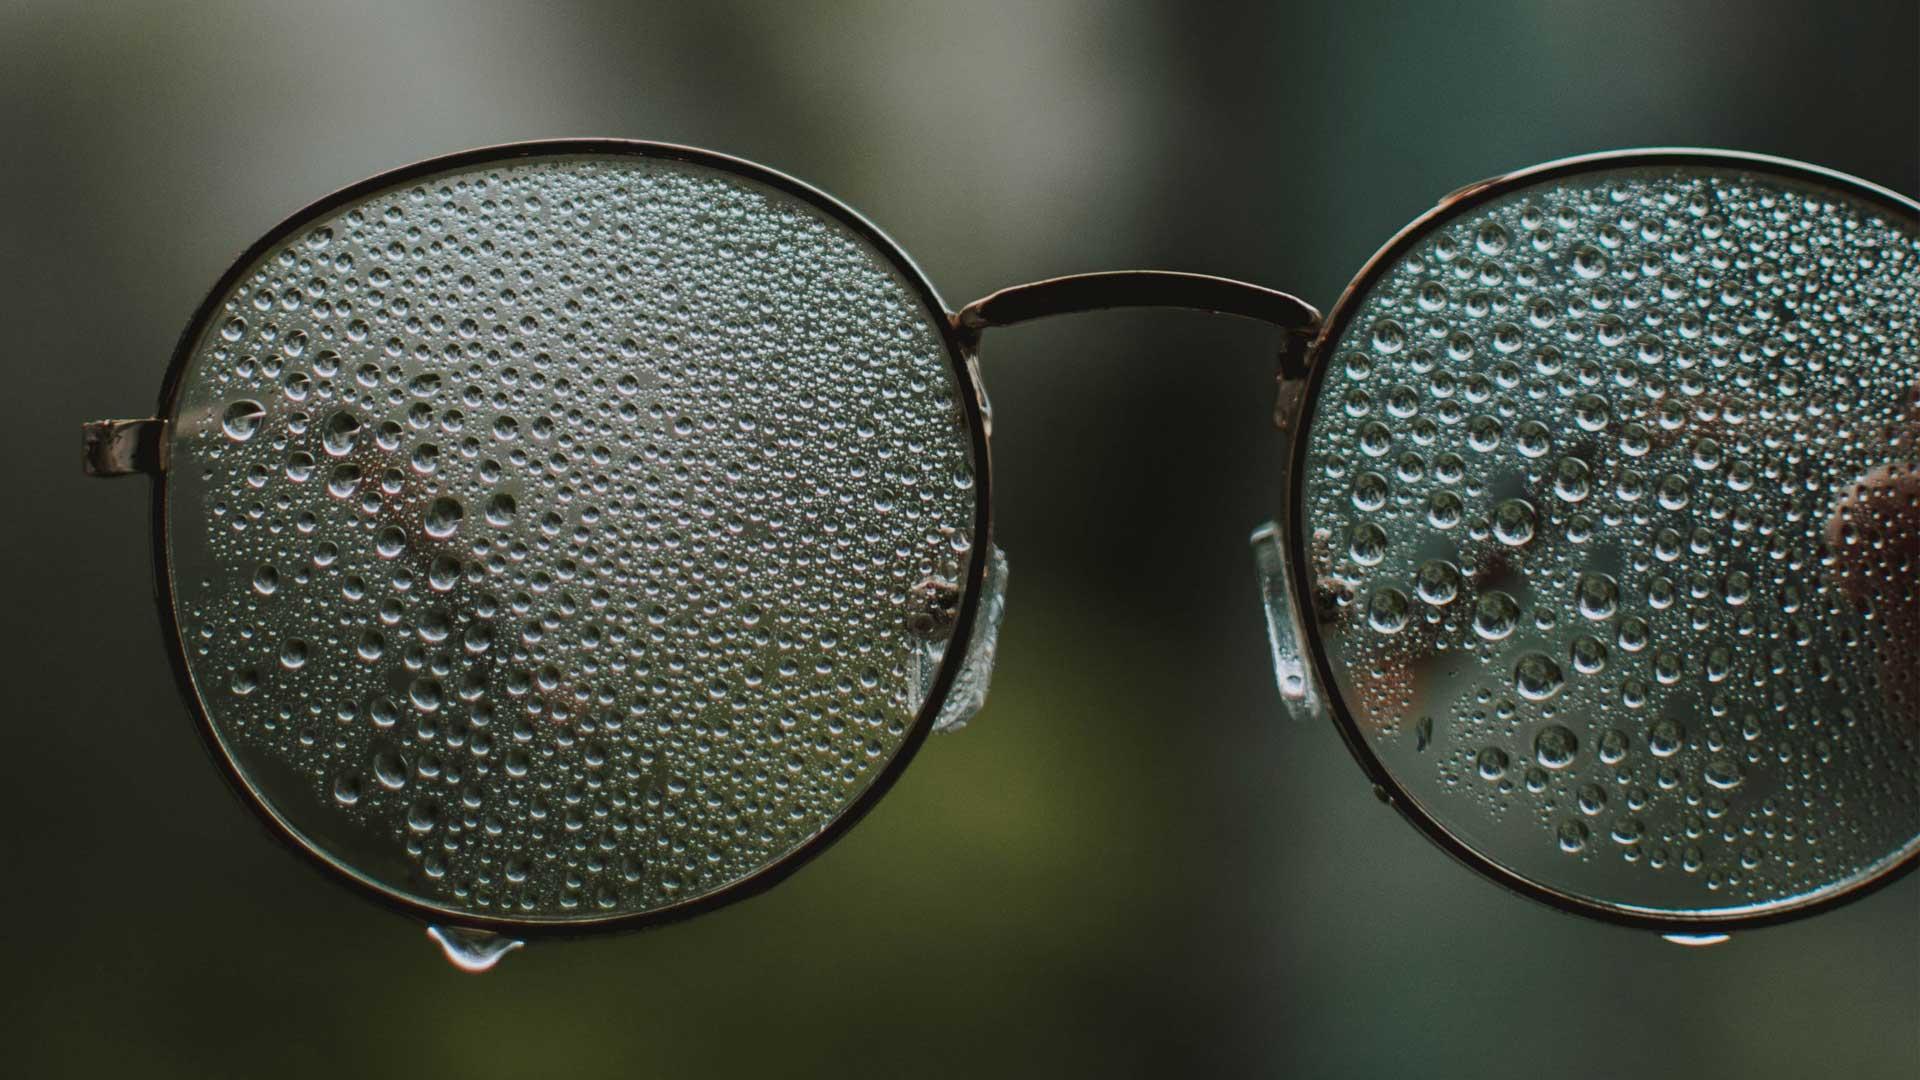 image-header-quand-le-leader-doit-nettoyer-ses-propres-lunettes